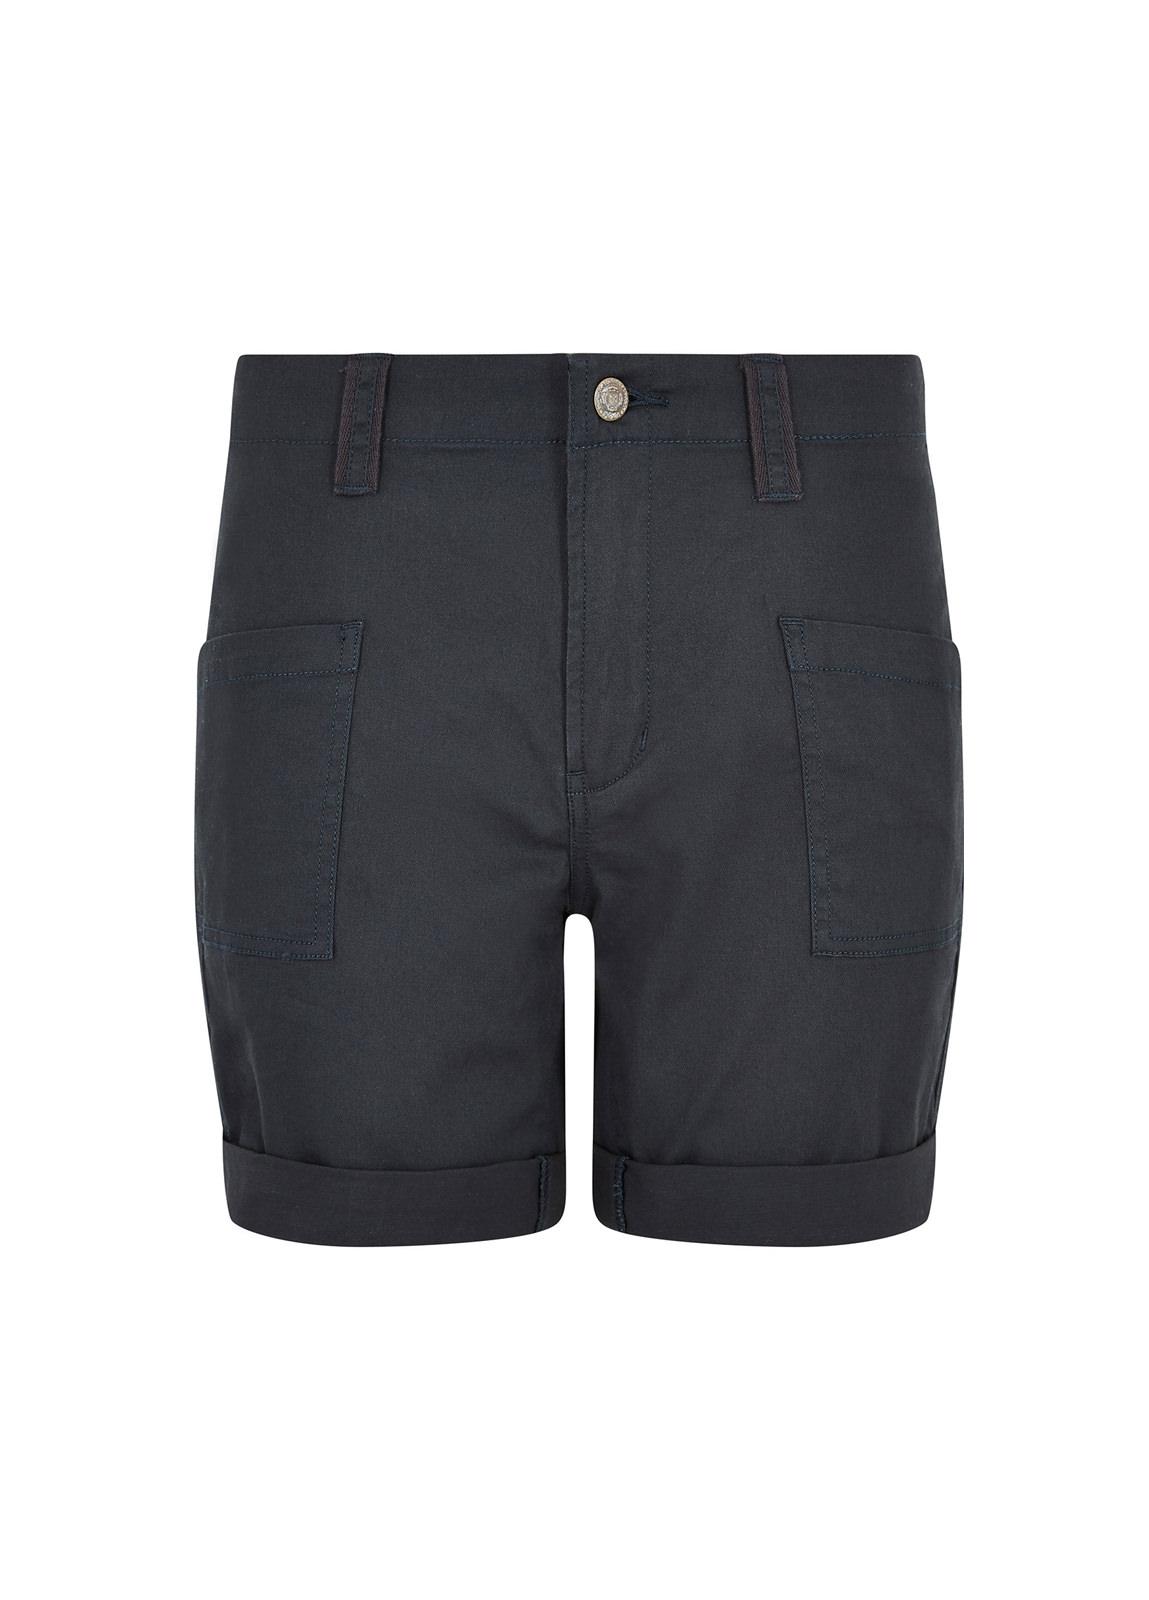 Bellinter Shorts - Navy